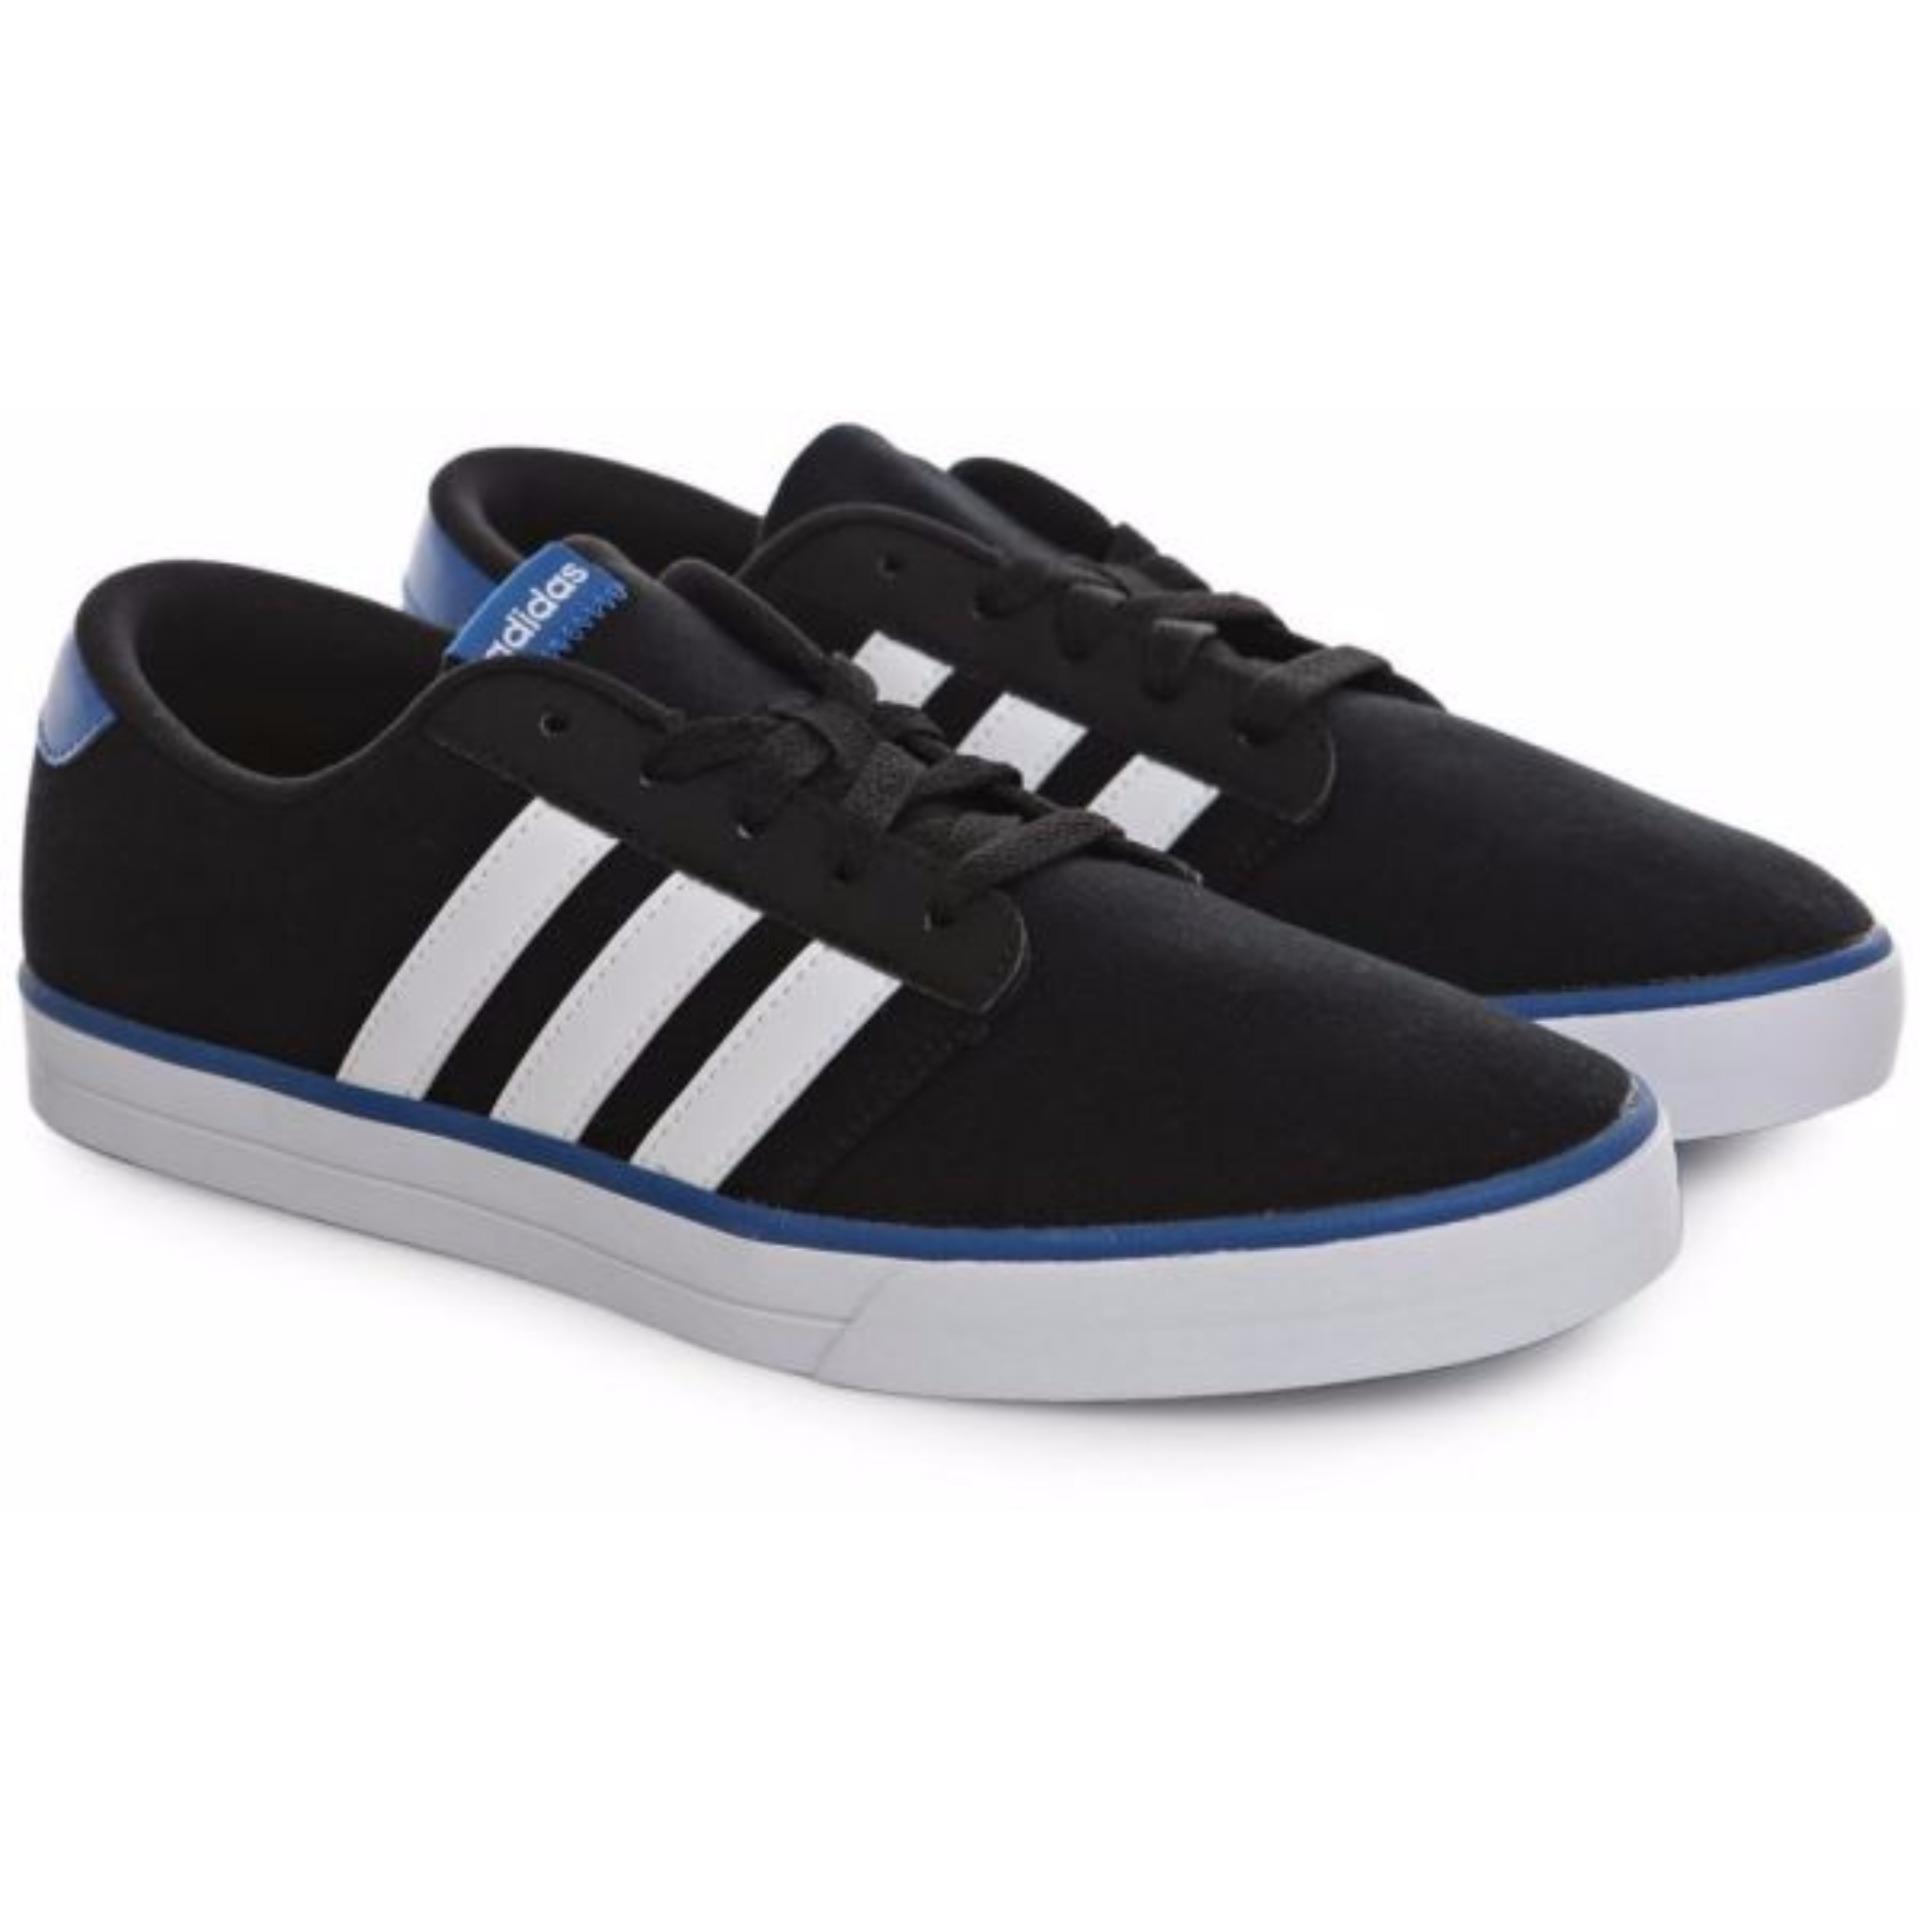 Berapa Harga Adidas Sepatu Sneaker Adineo Vs Skate Aq1484 Hitam Biru Di Jawa Barat